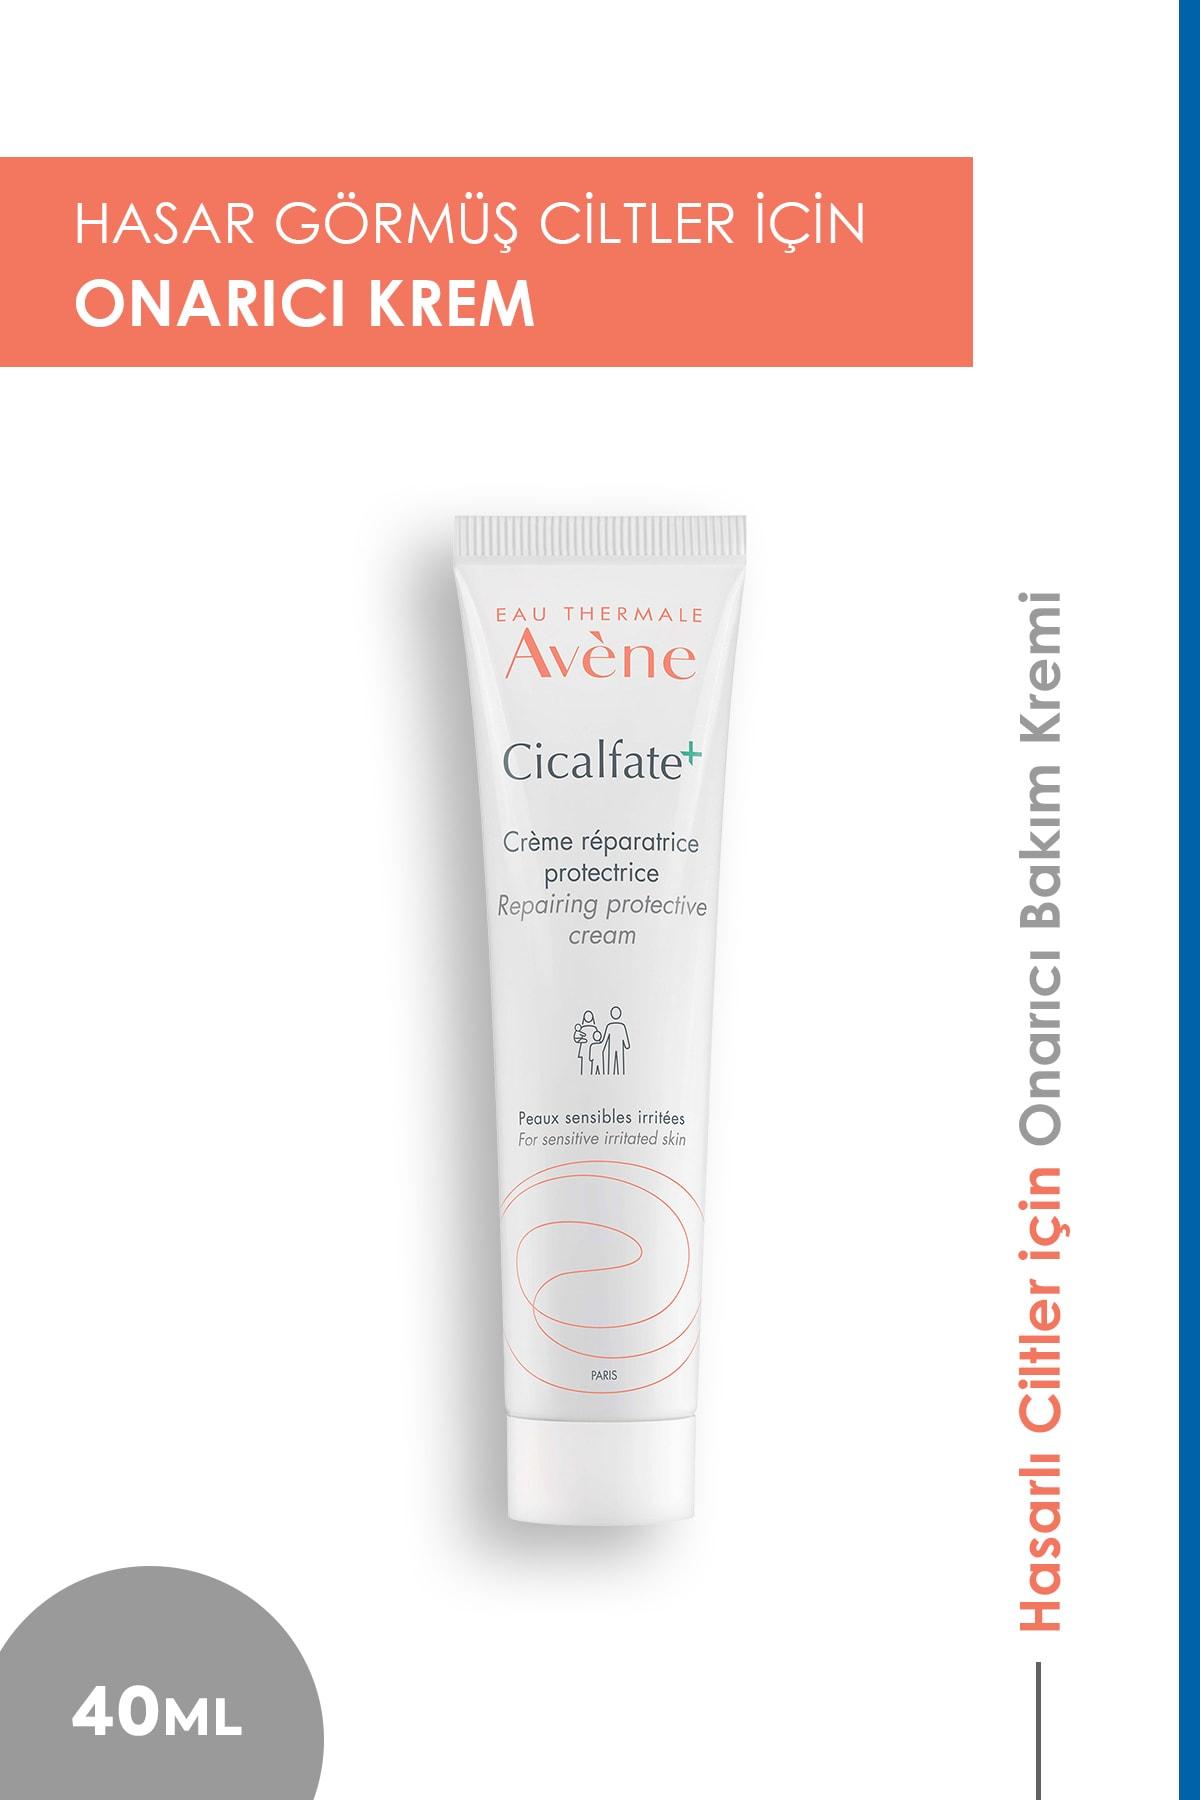 Avene Cicalfate+ Restorative Protective Cream 40ml 1